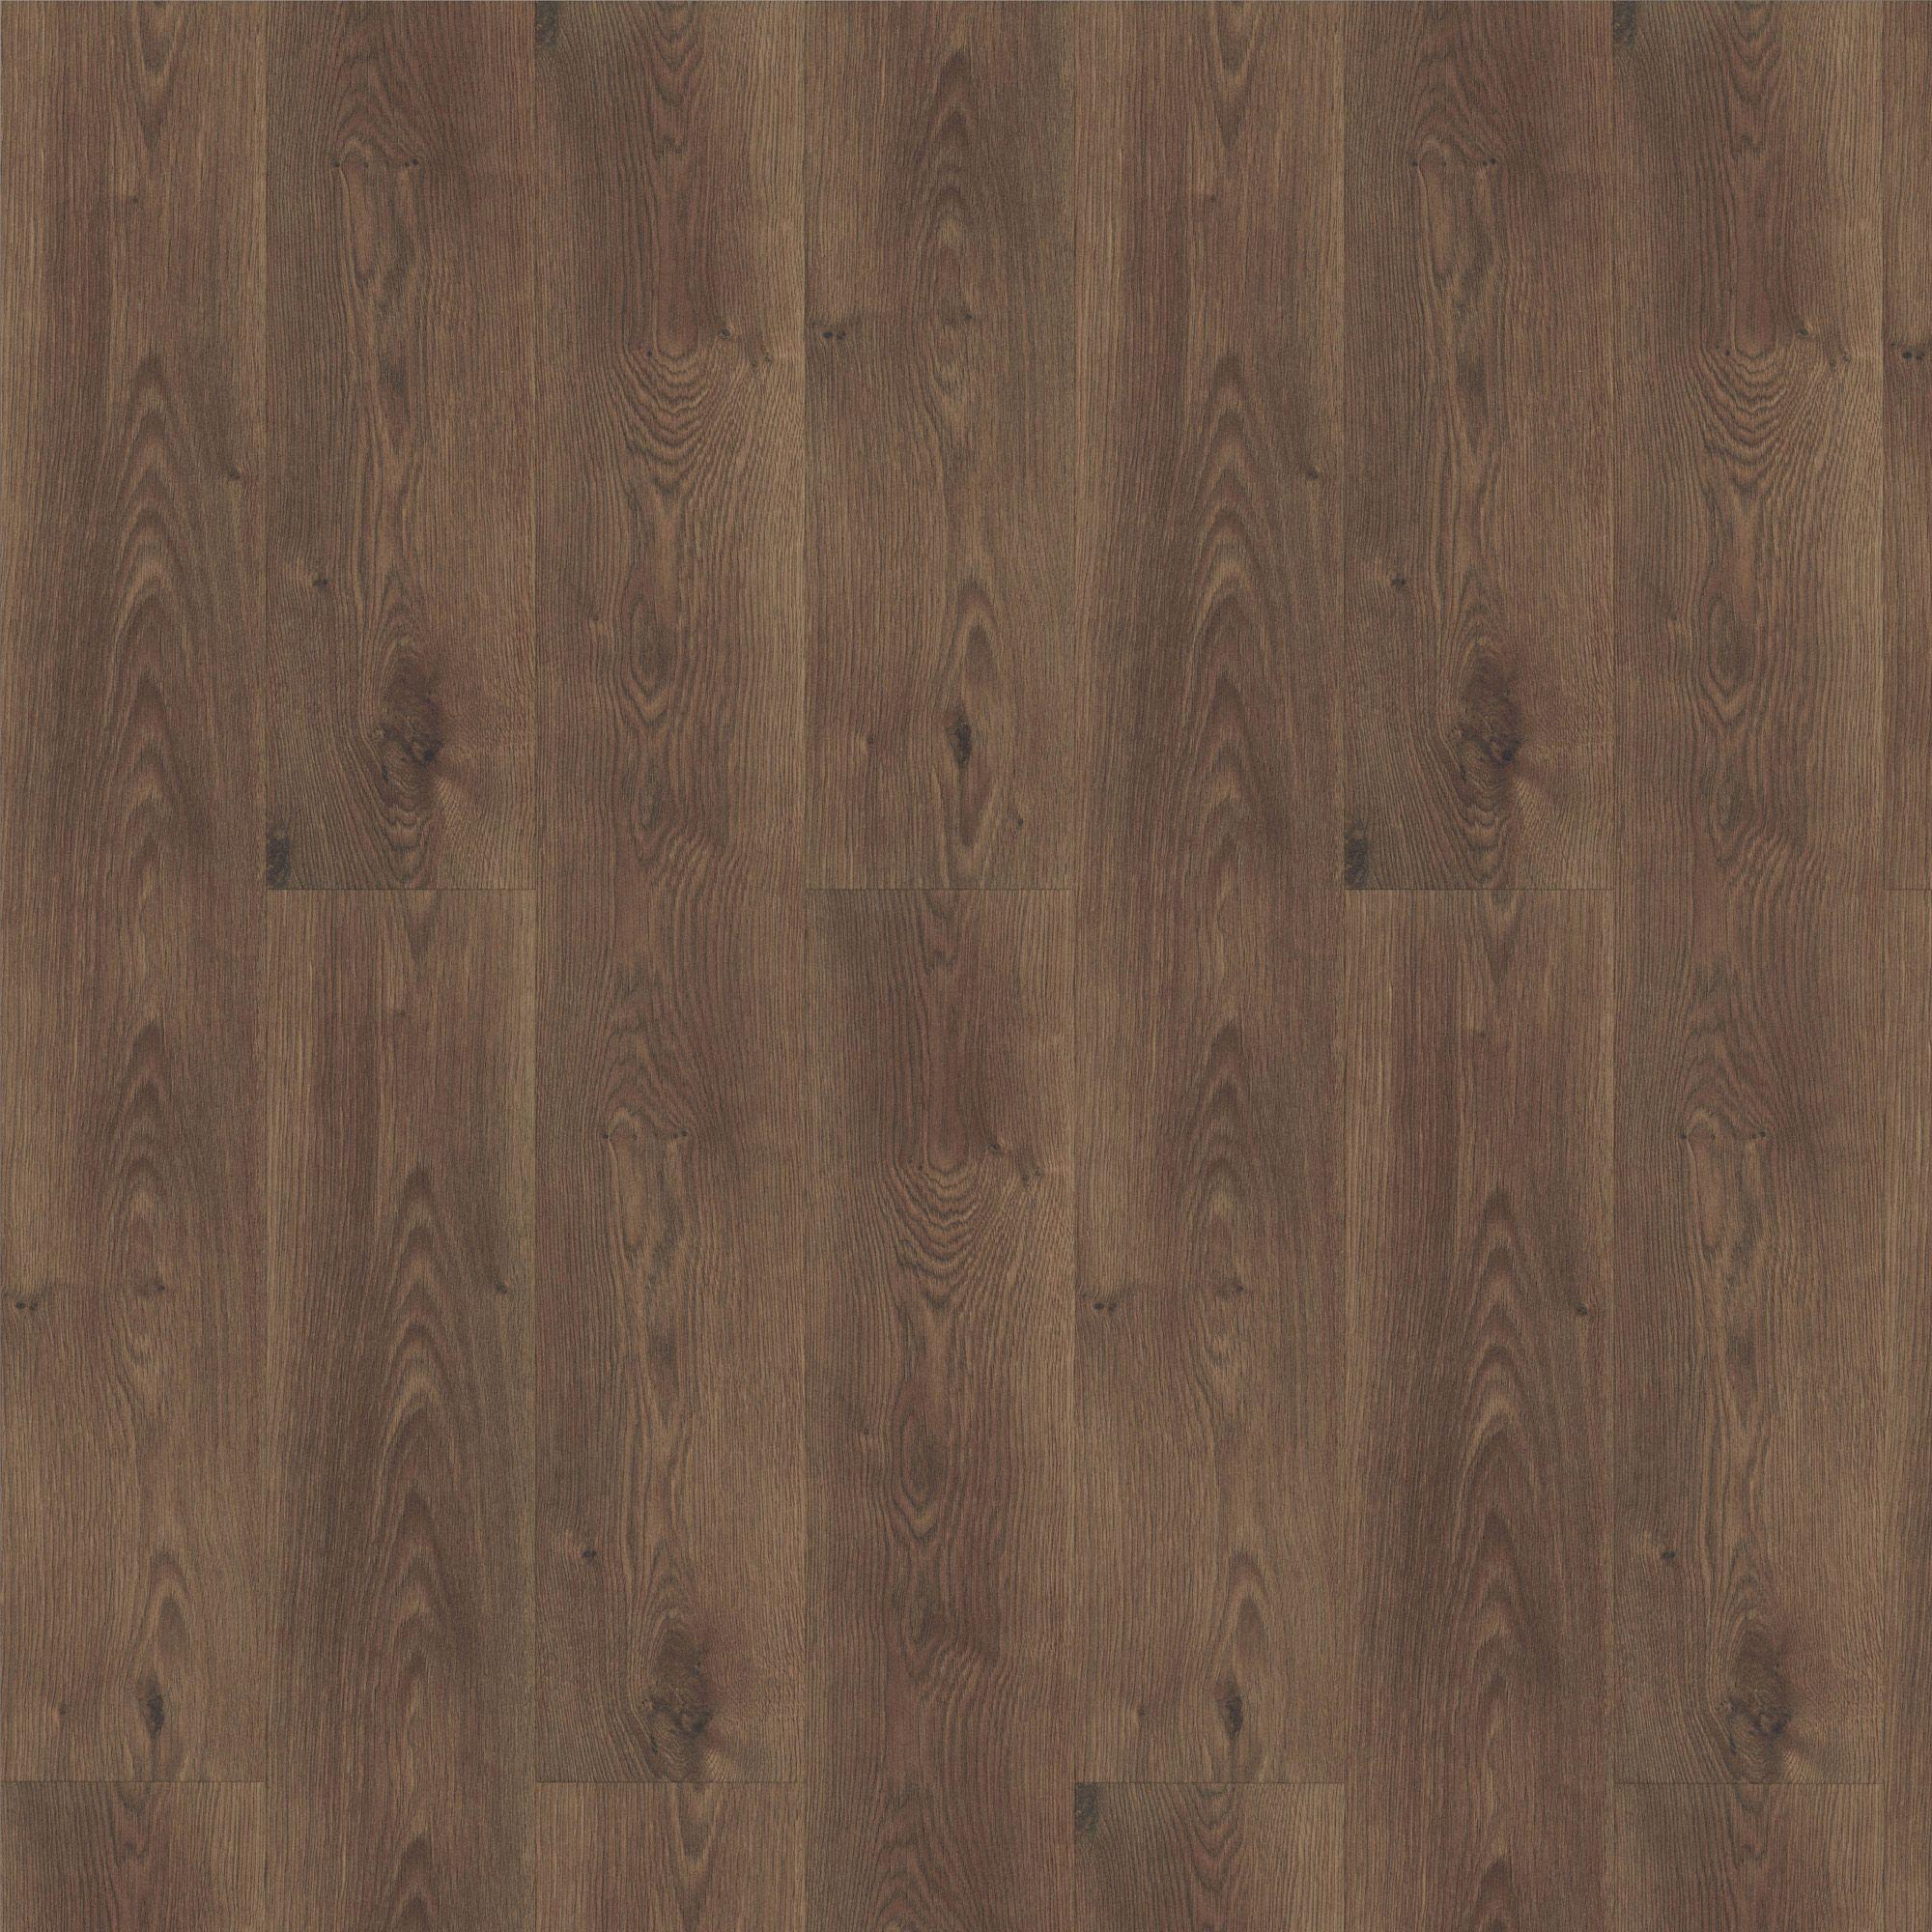 Kitchen Laminate Flooring B And Q Overture Natural Virginia Oak Effect